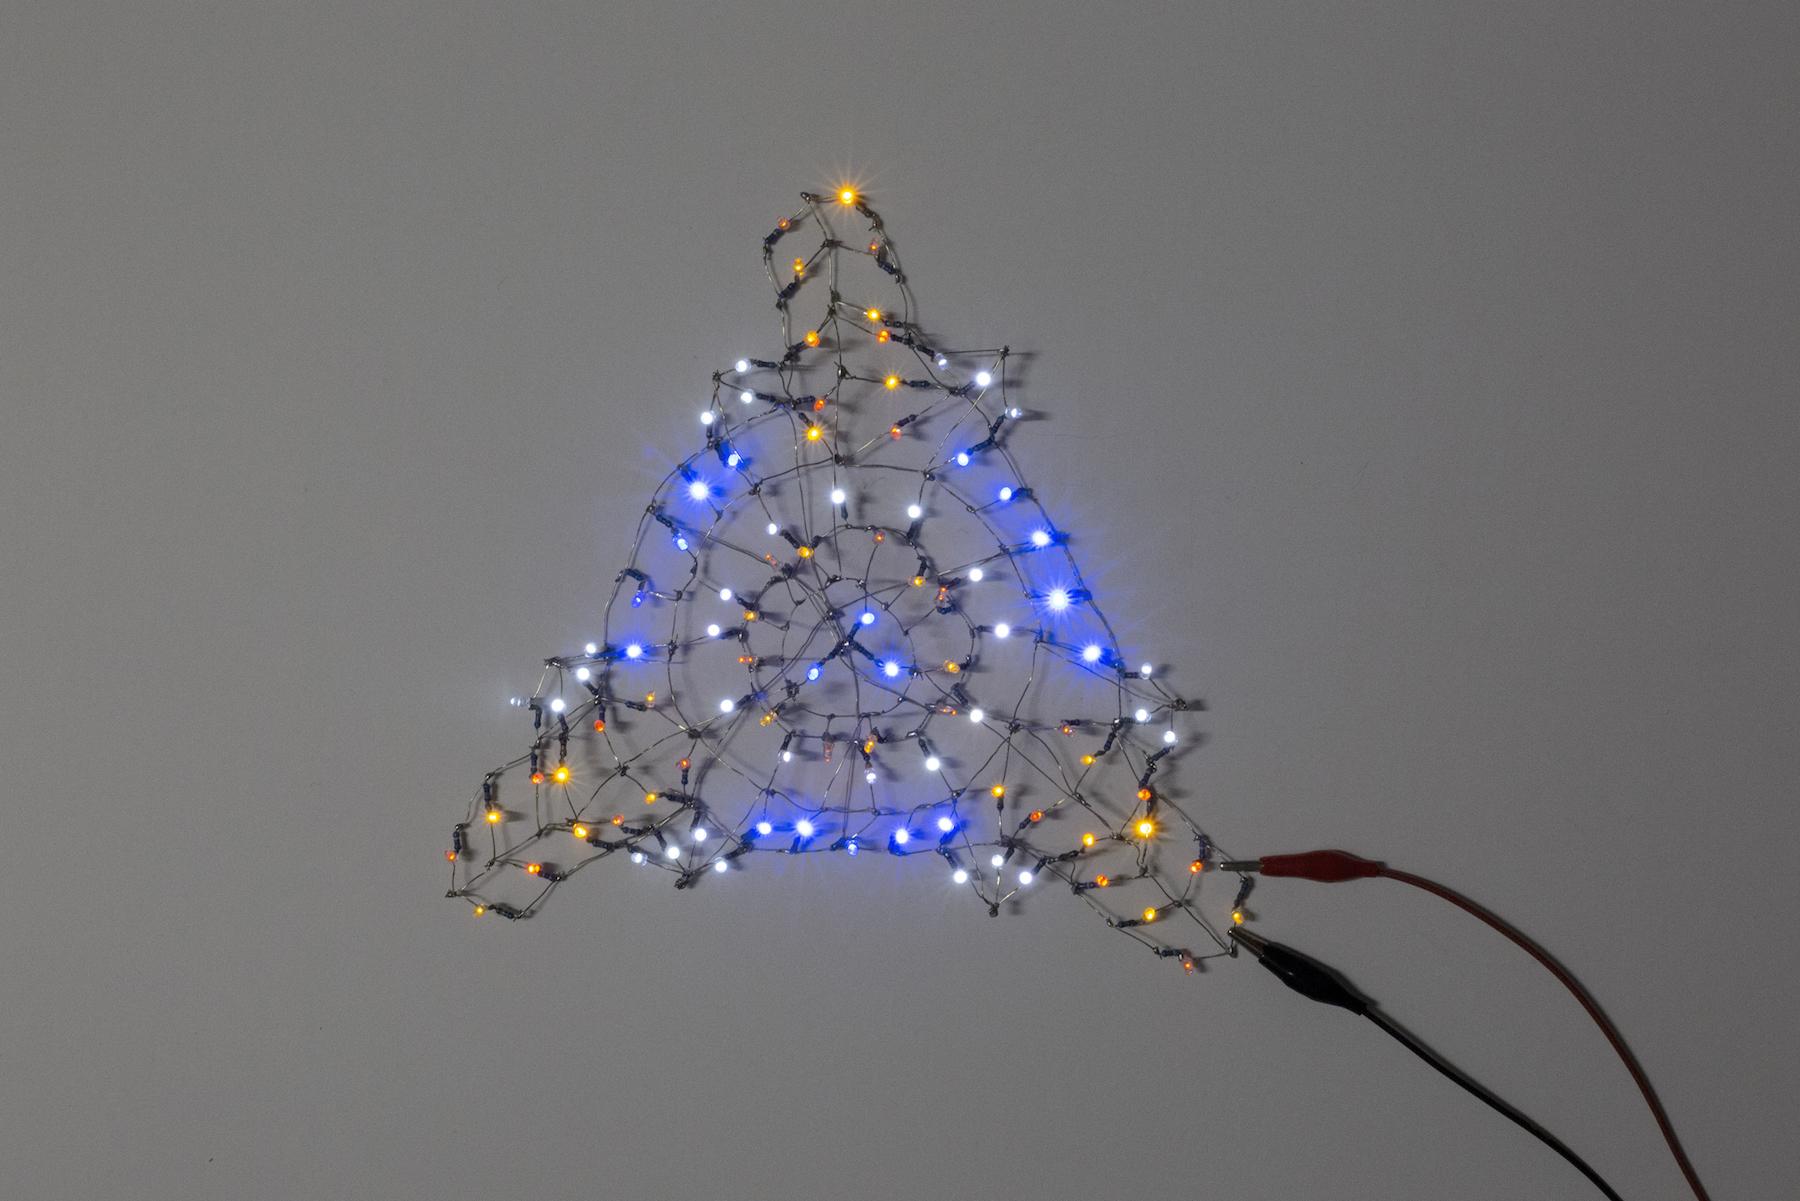 Salmanson_LighterThanAir18-View3_LED+wire_9.2x10x1.4_2018.jpg